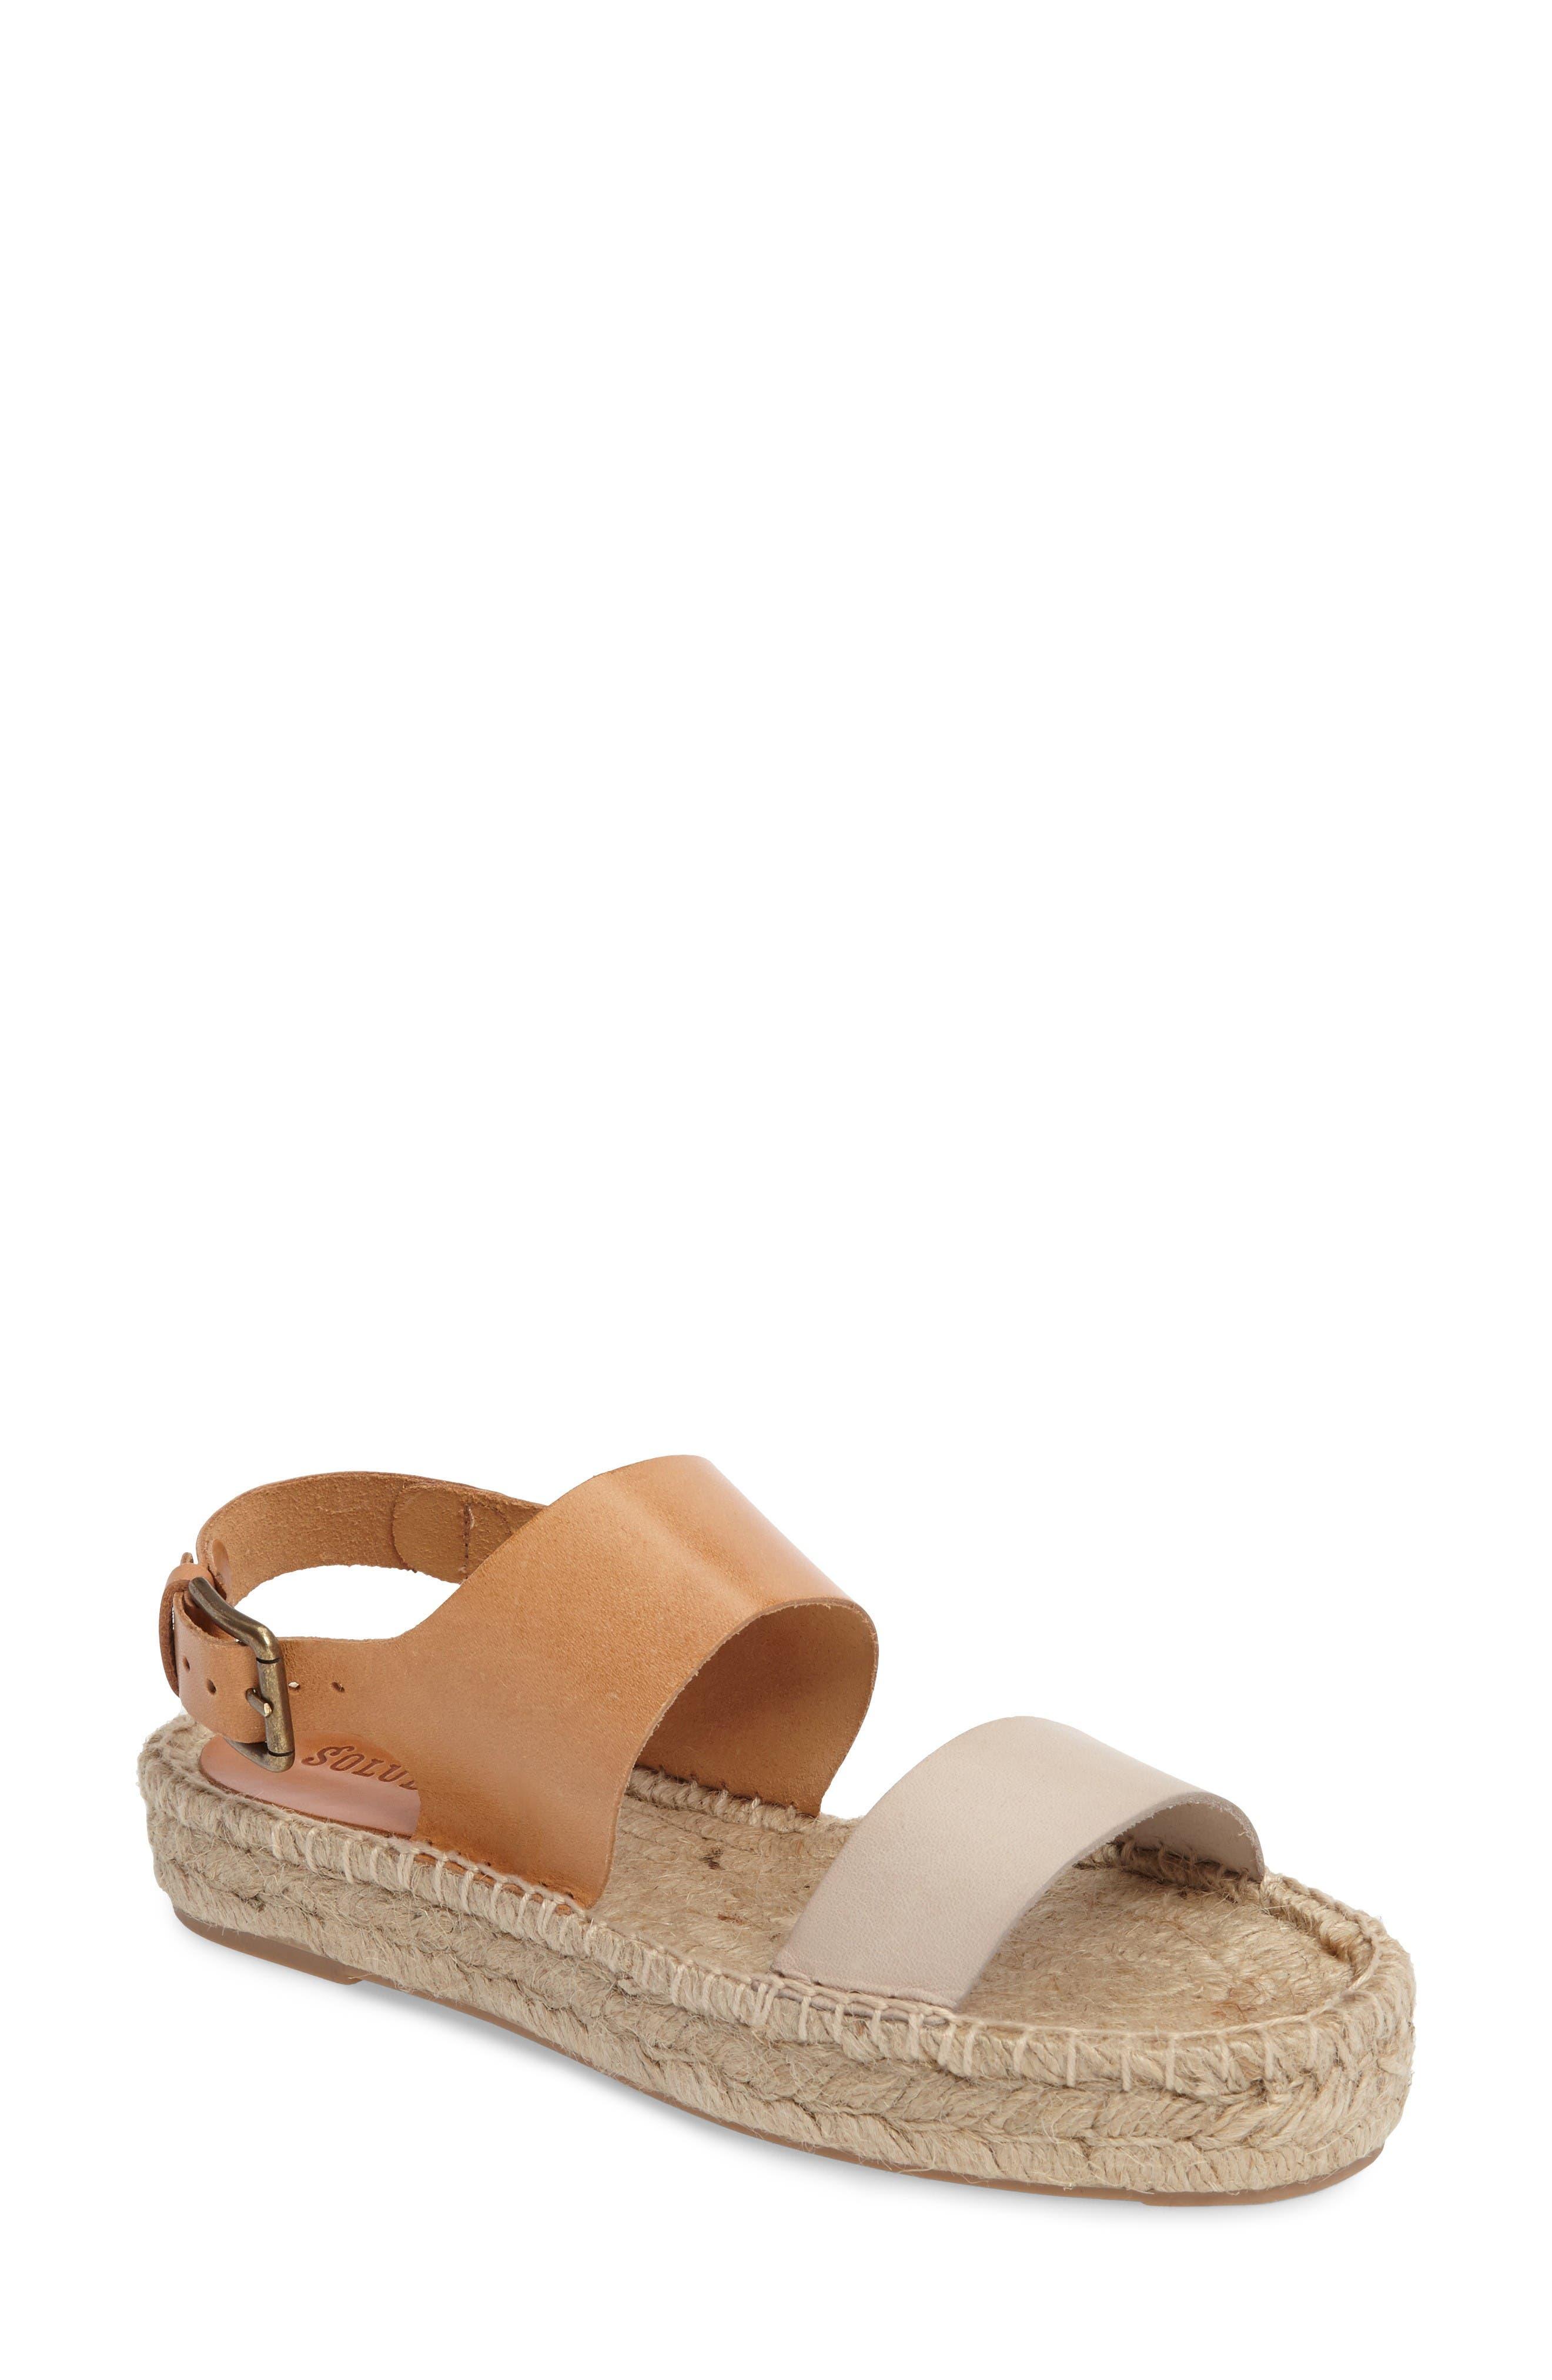 Soludos Platform Espadrille Sandal (Women)